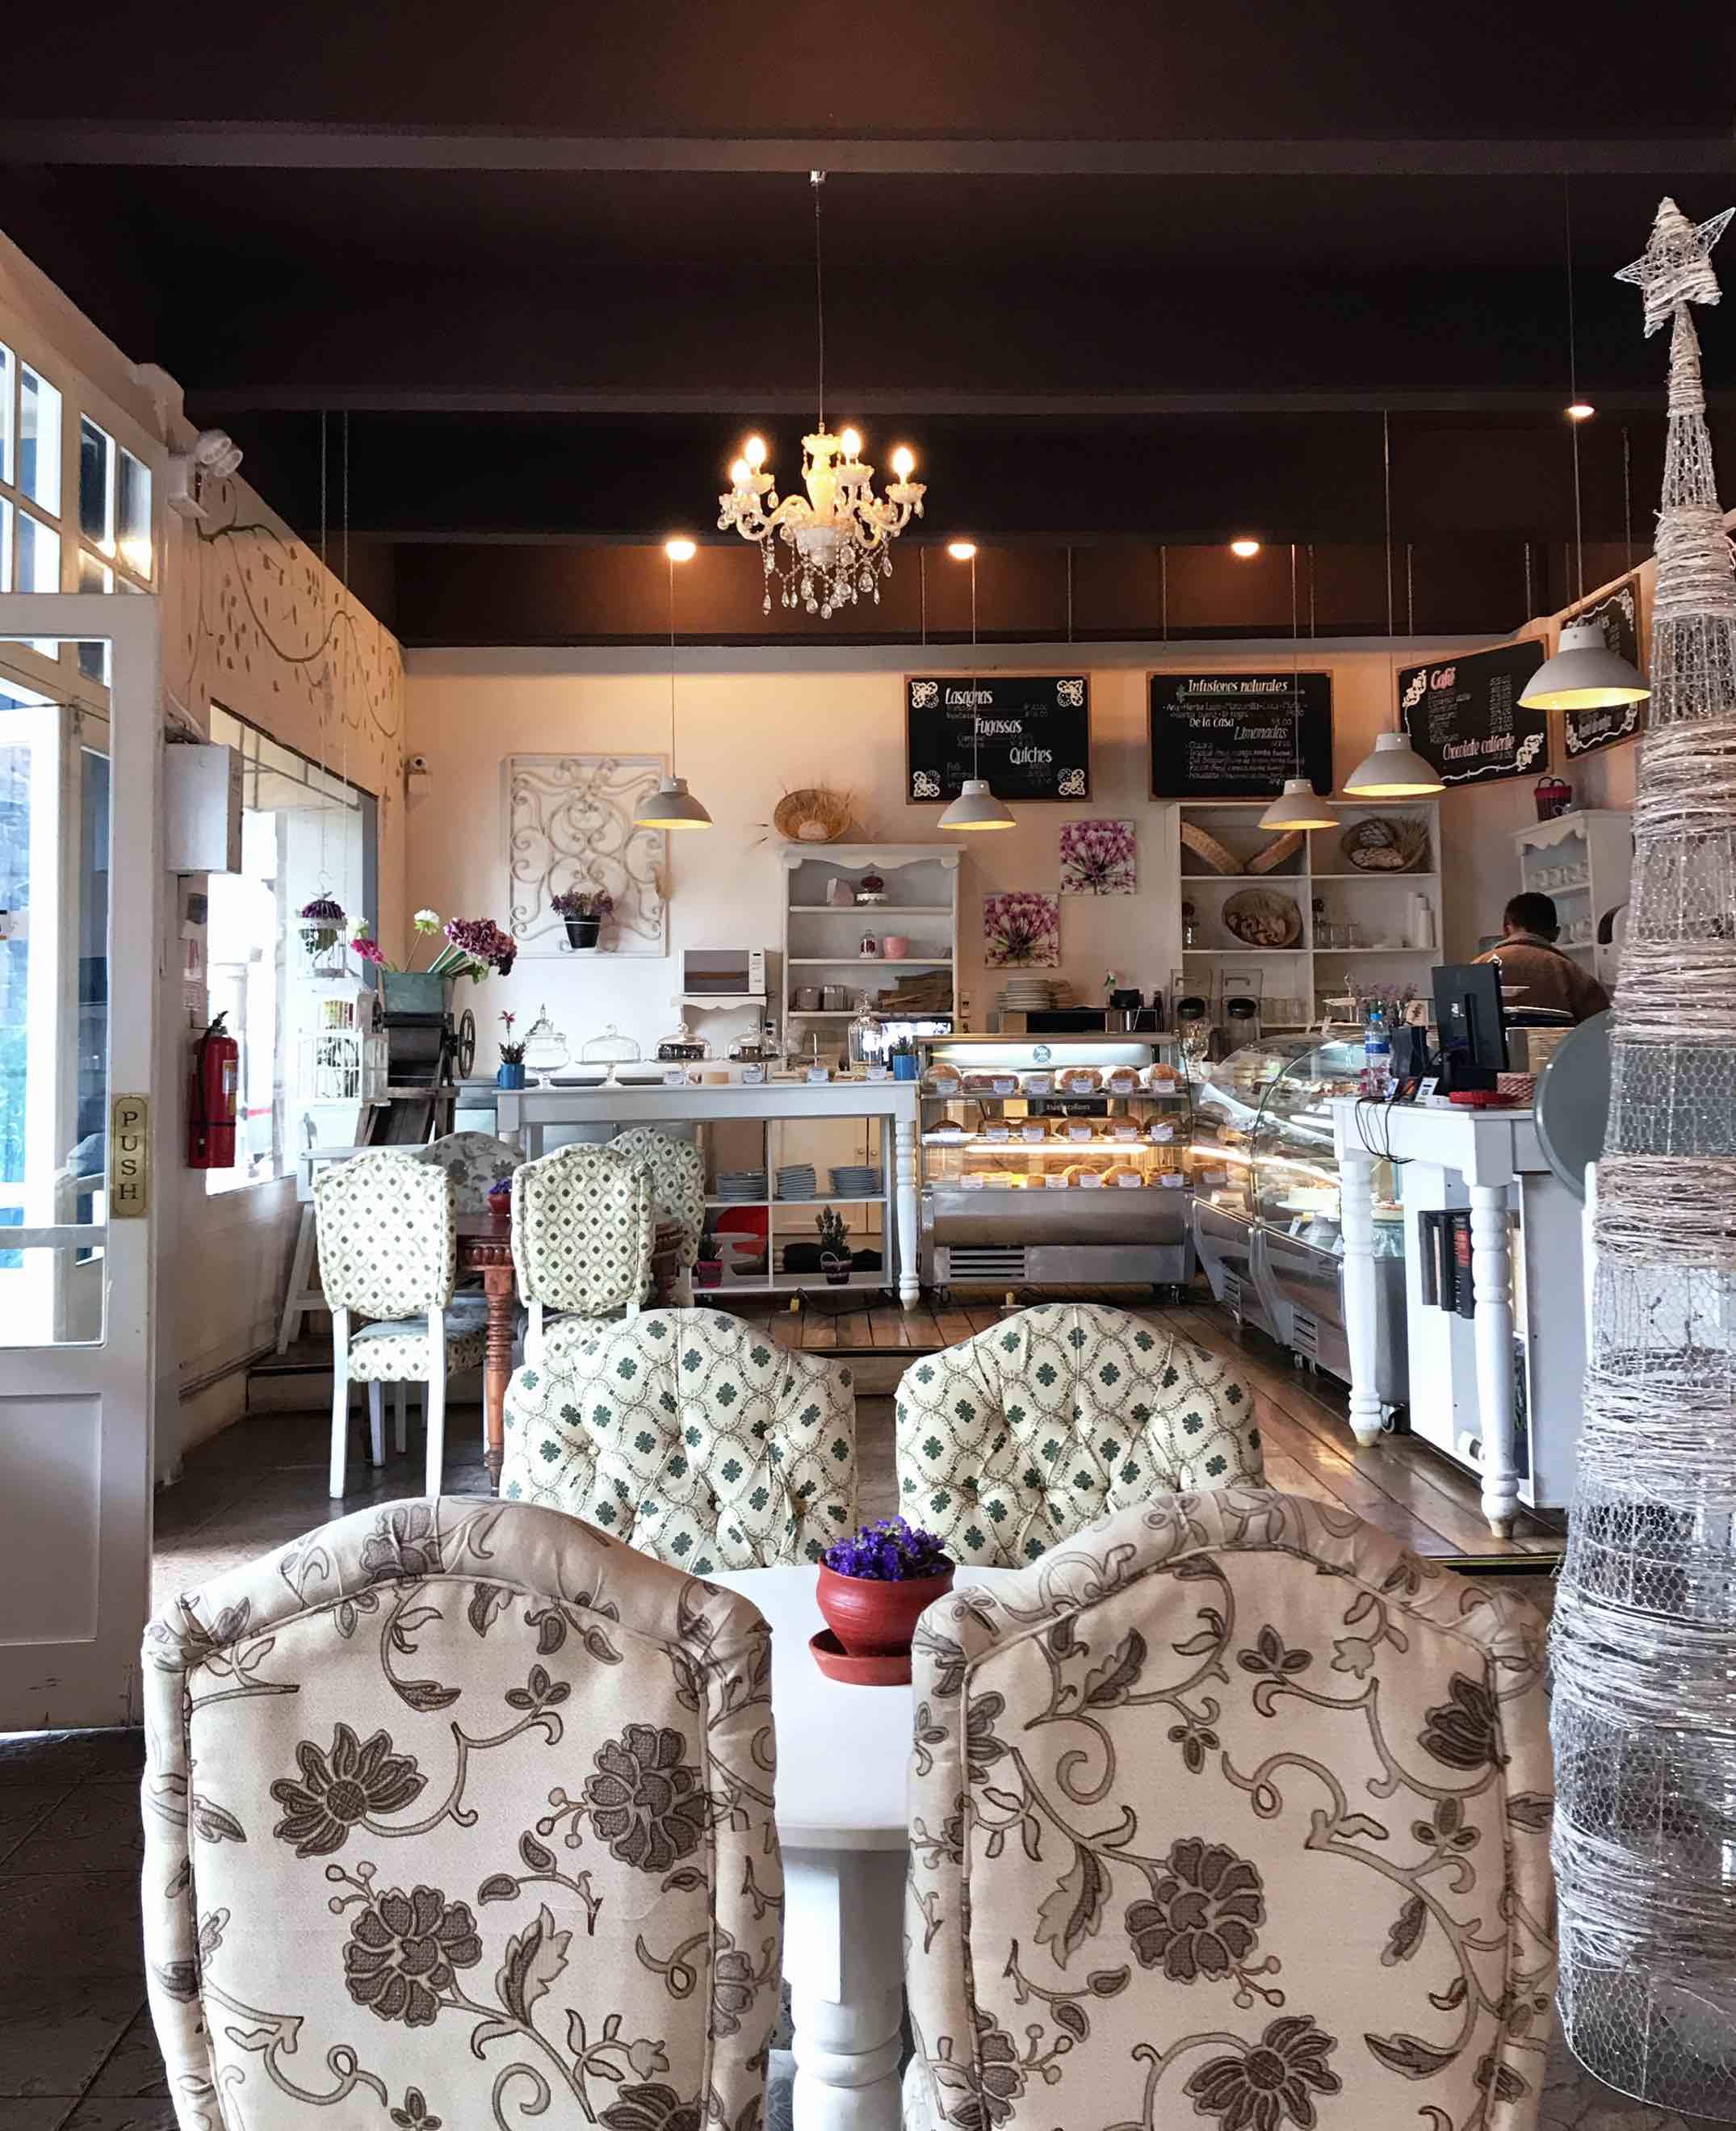 Shabby chic and cozy interior